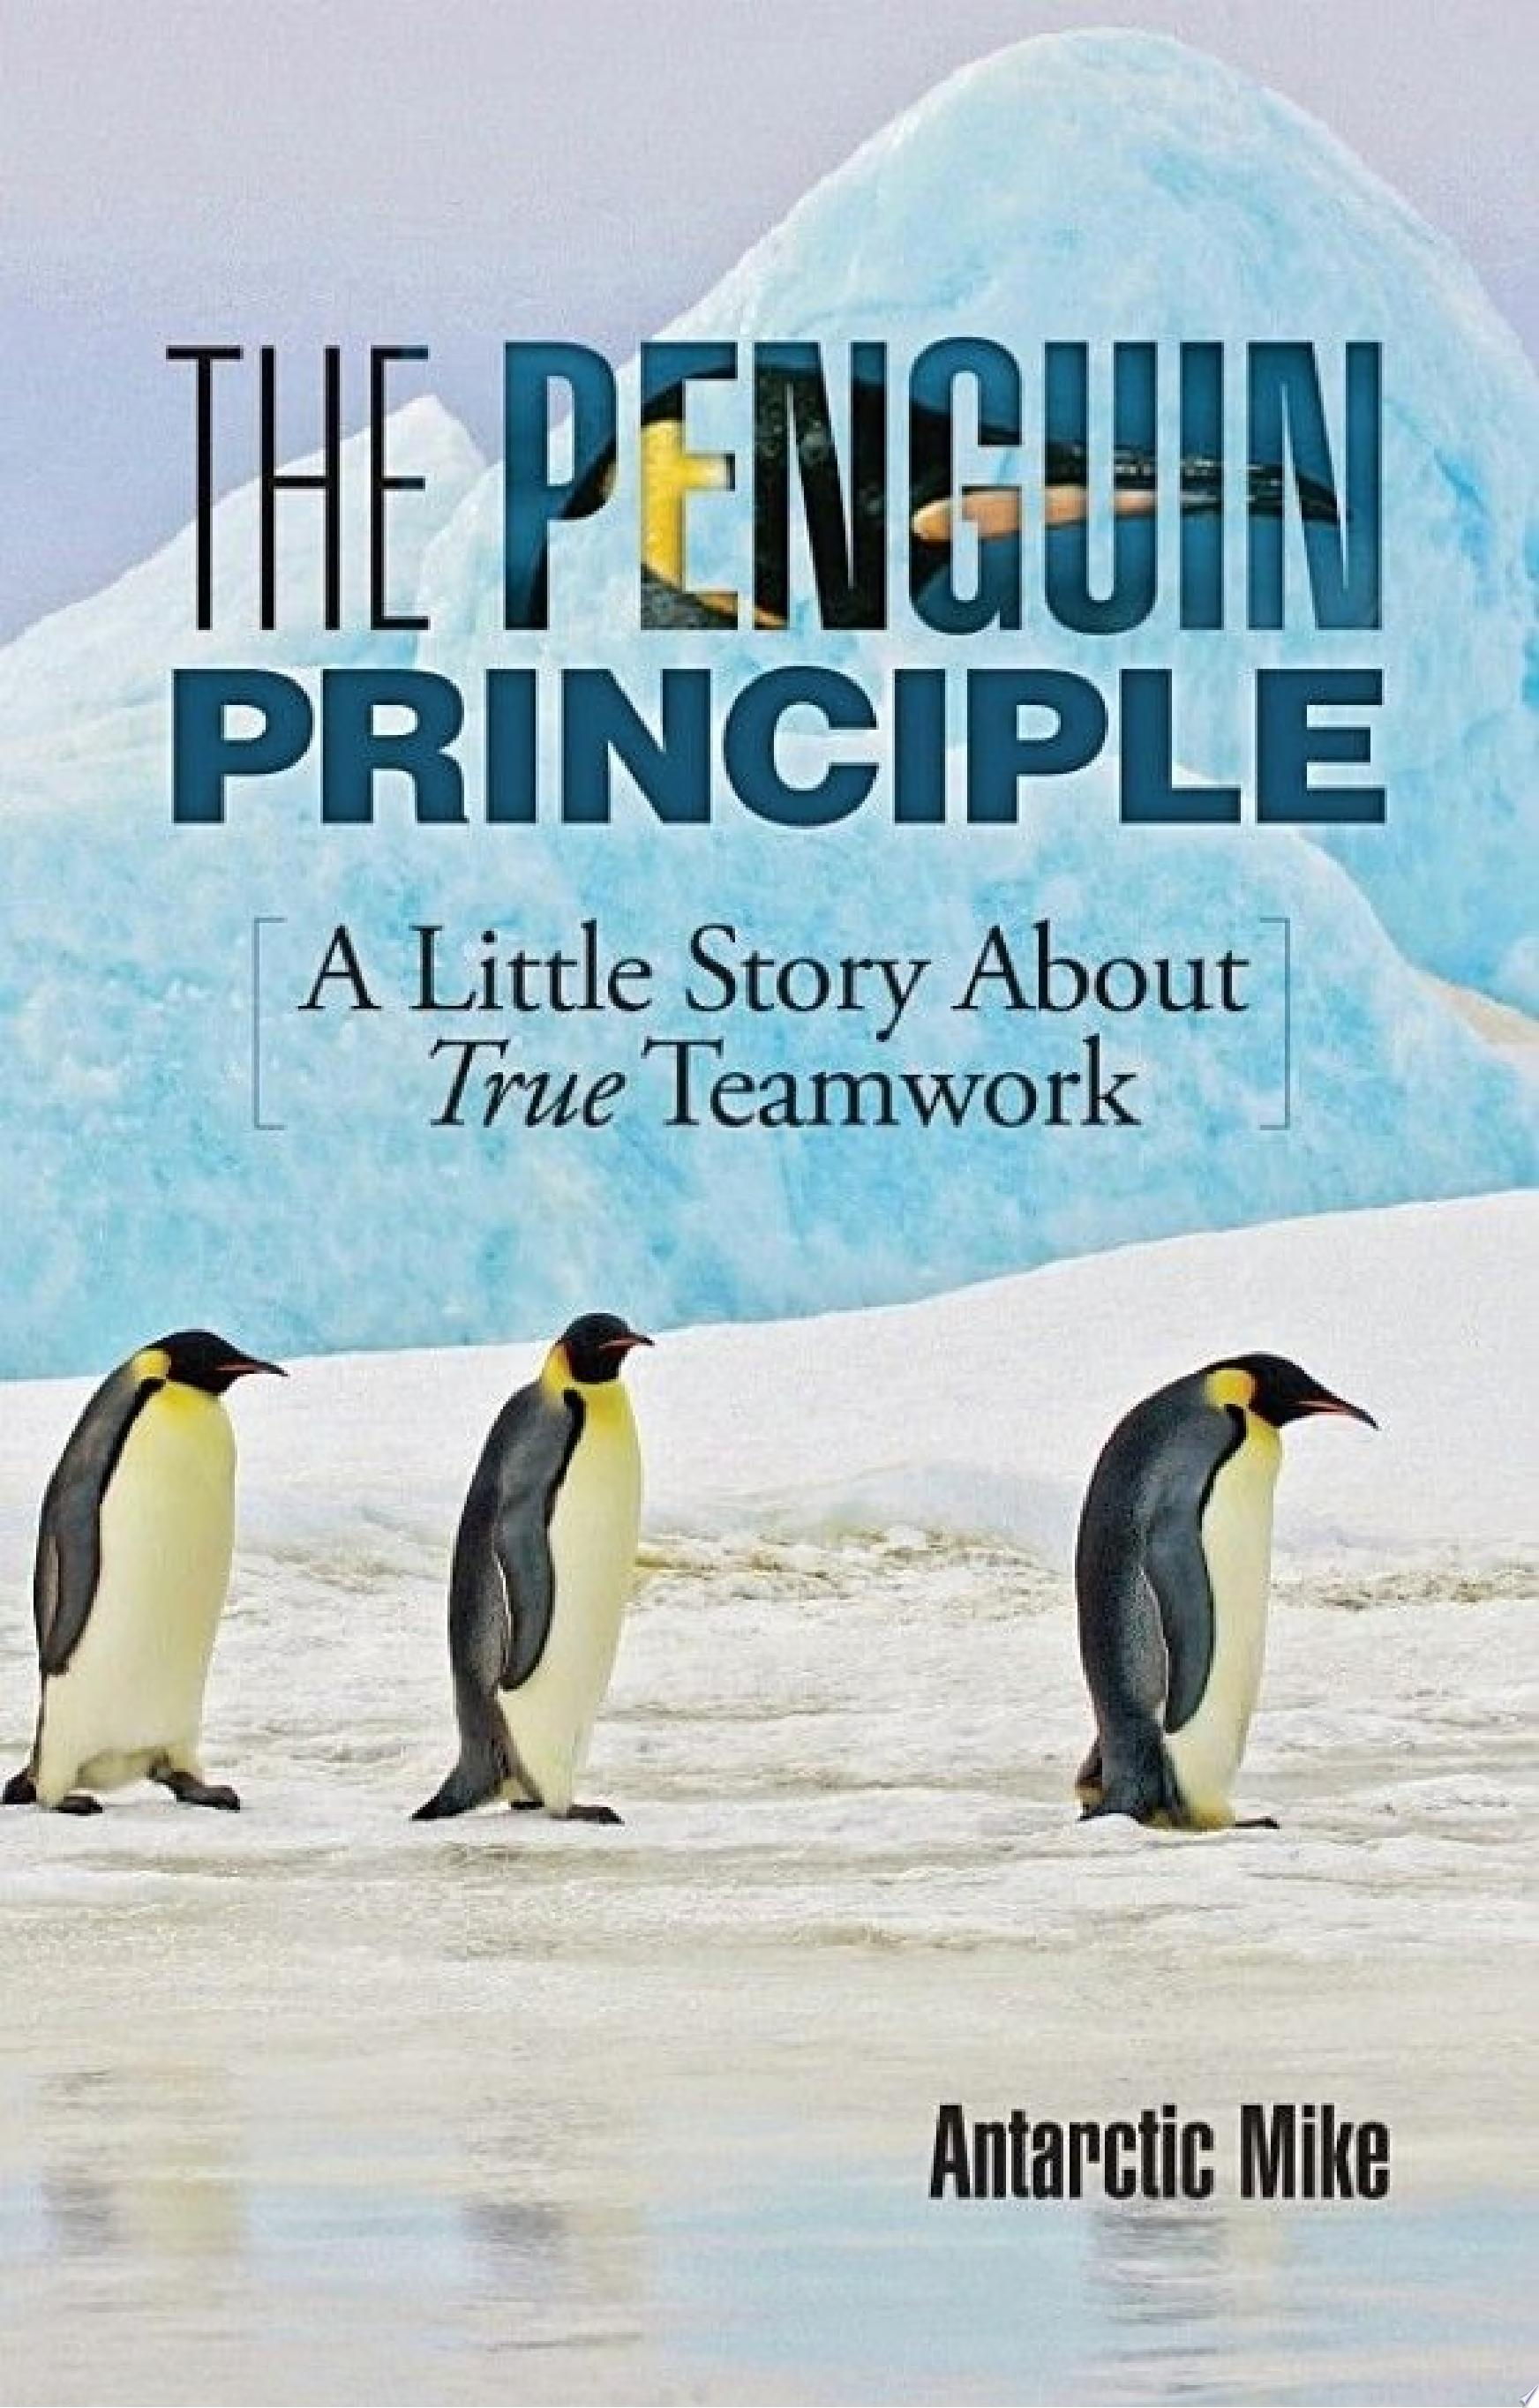 The Penguin Principle